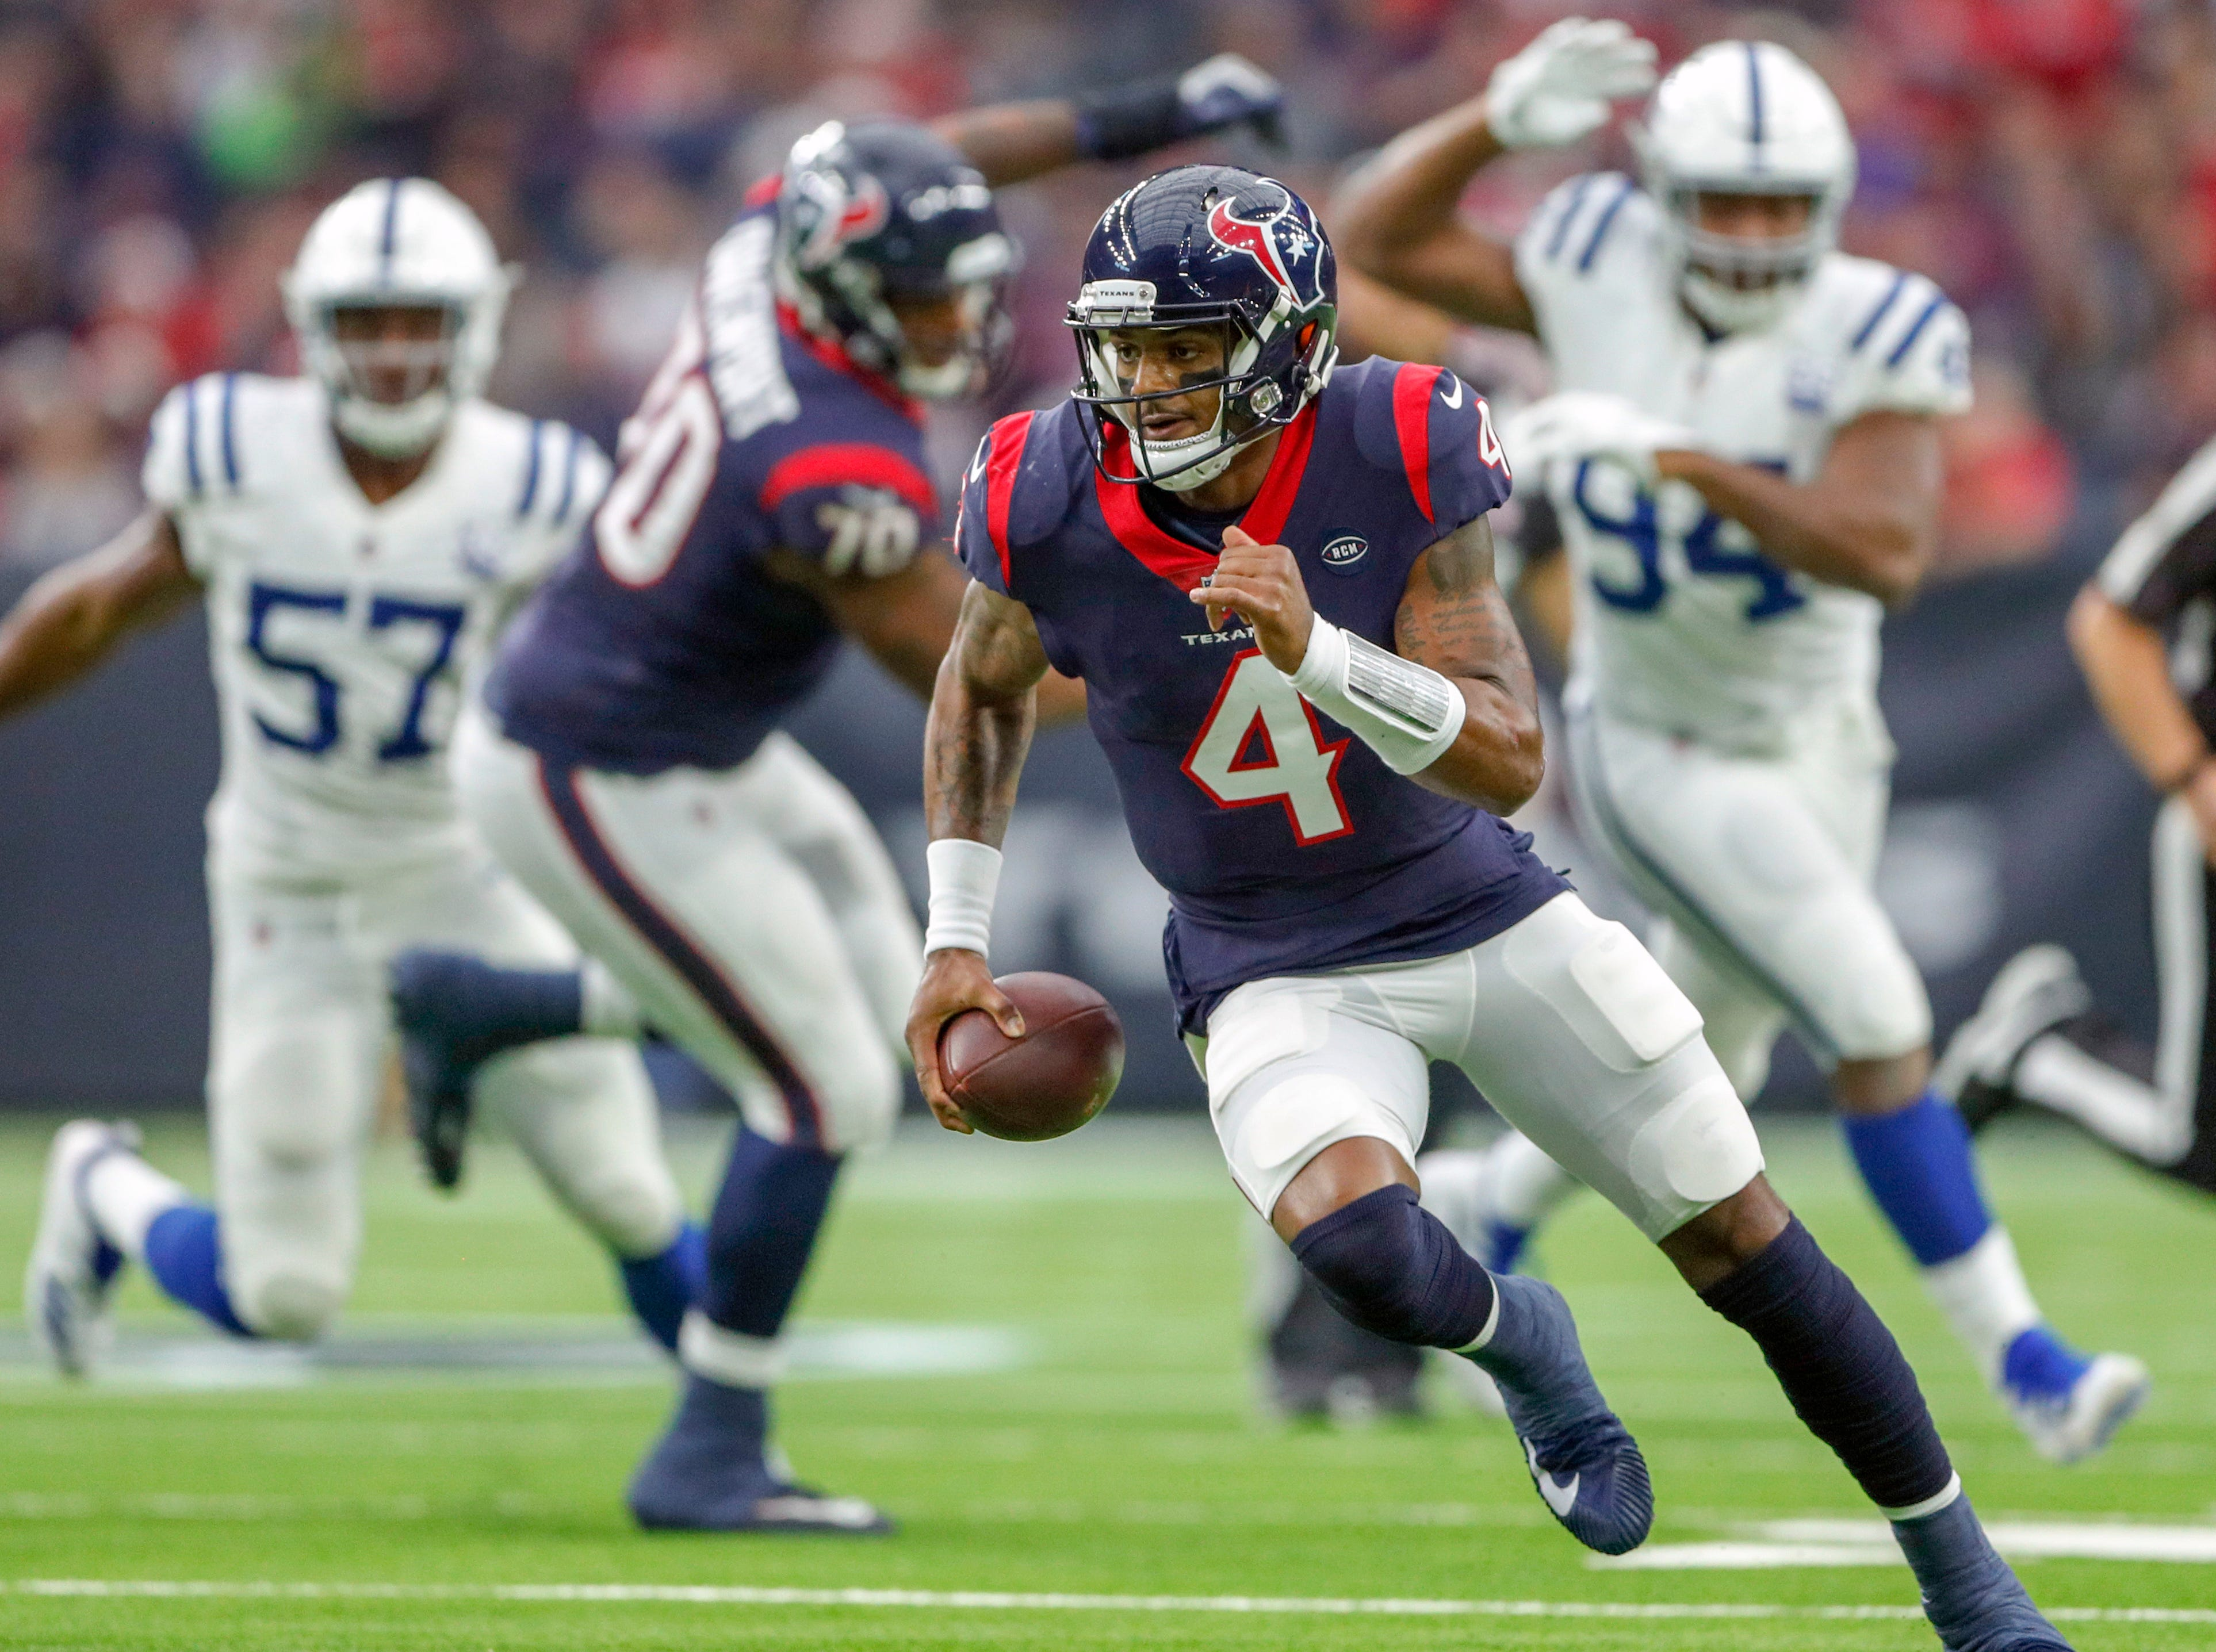 Houston Texans quarterback Deshaun Watson (4) scrambles against the Indianapolis Colts at NRG Stadium in Houston on Sunday, Dec. 9, 2018.